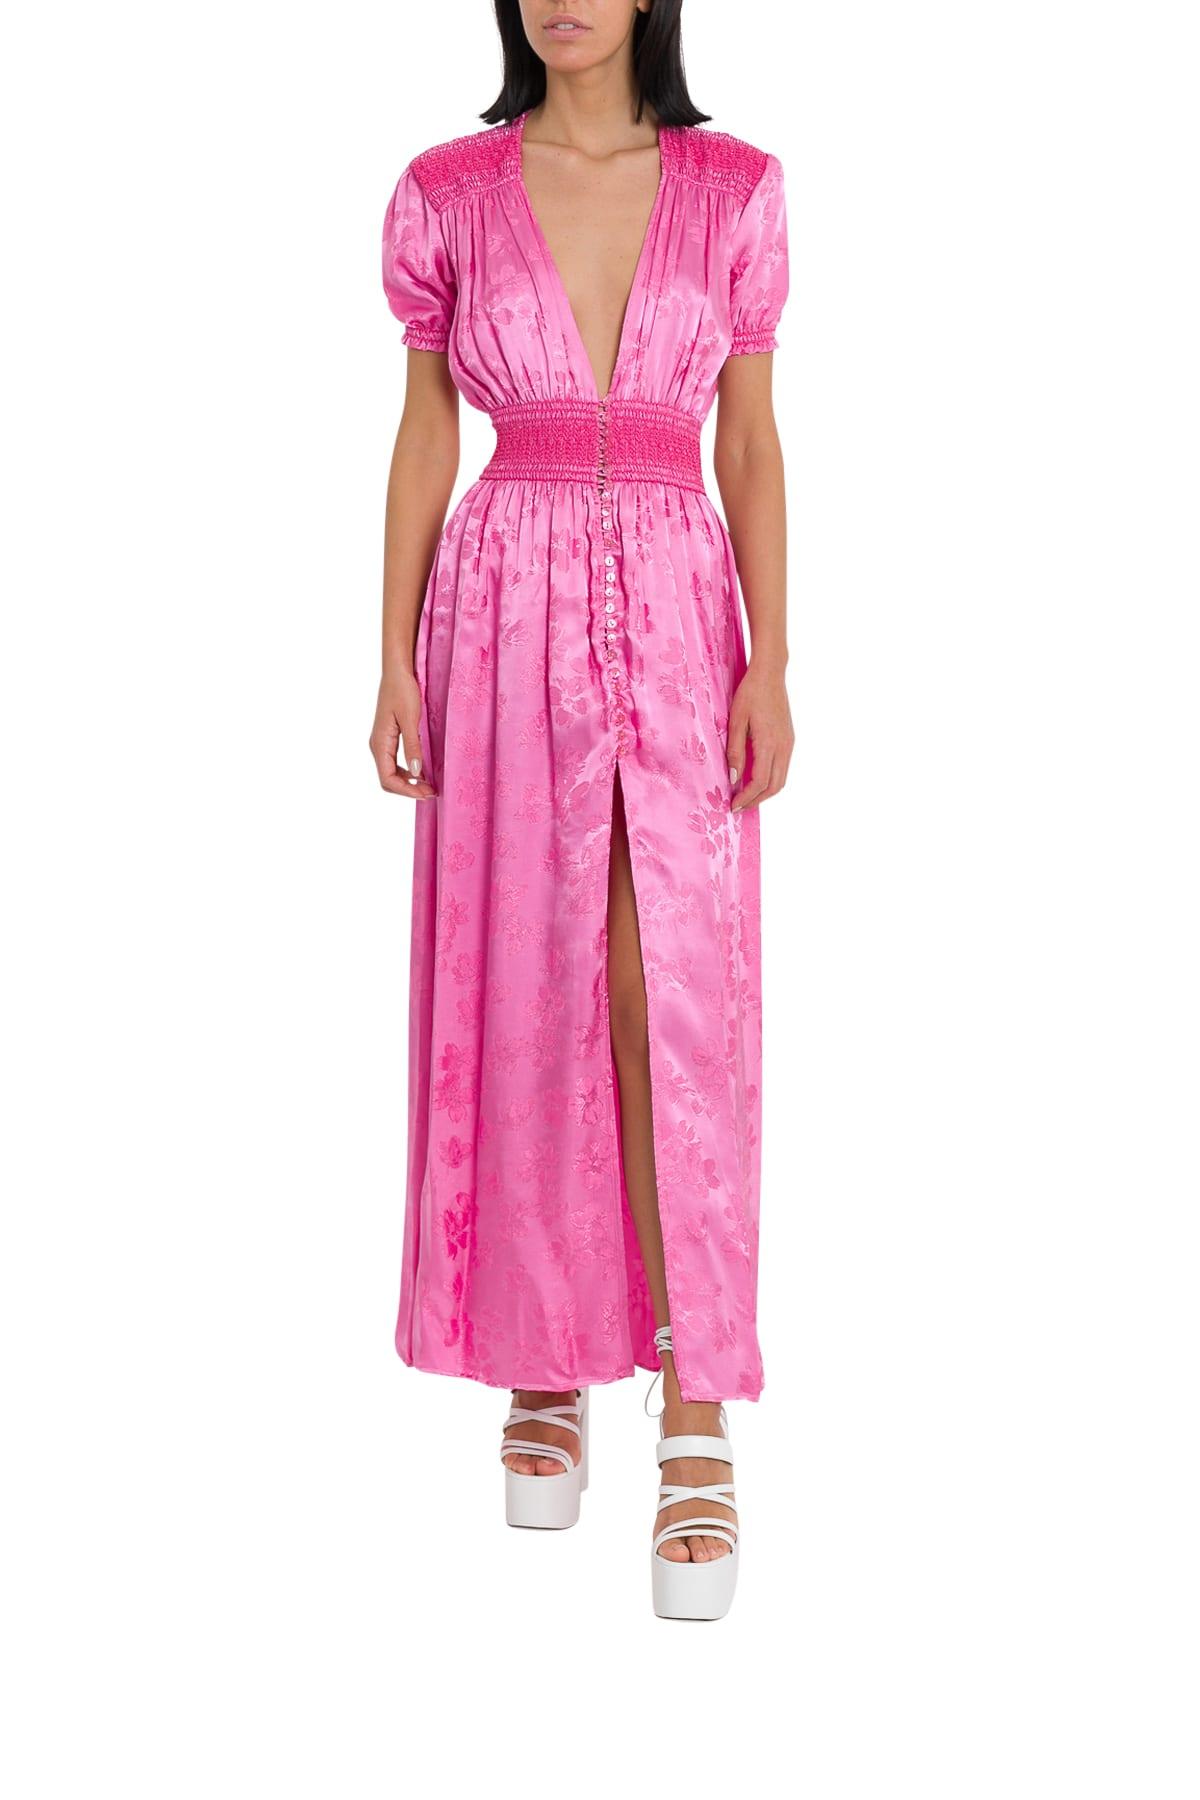 The Attico Borcade Long Dress